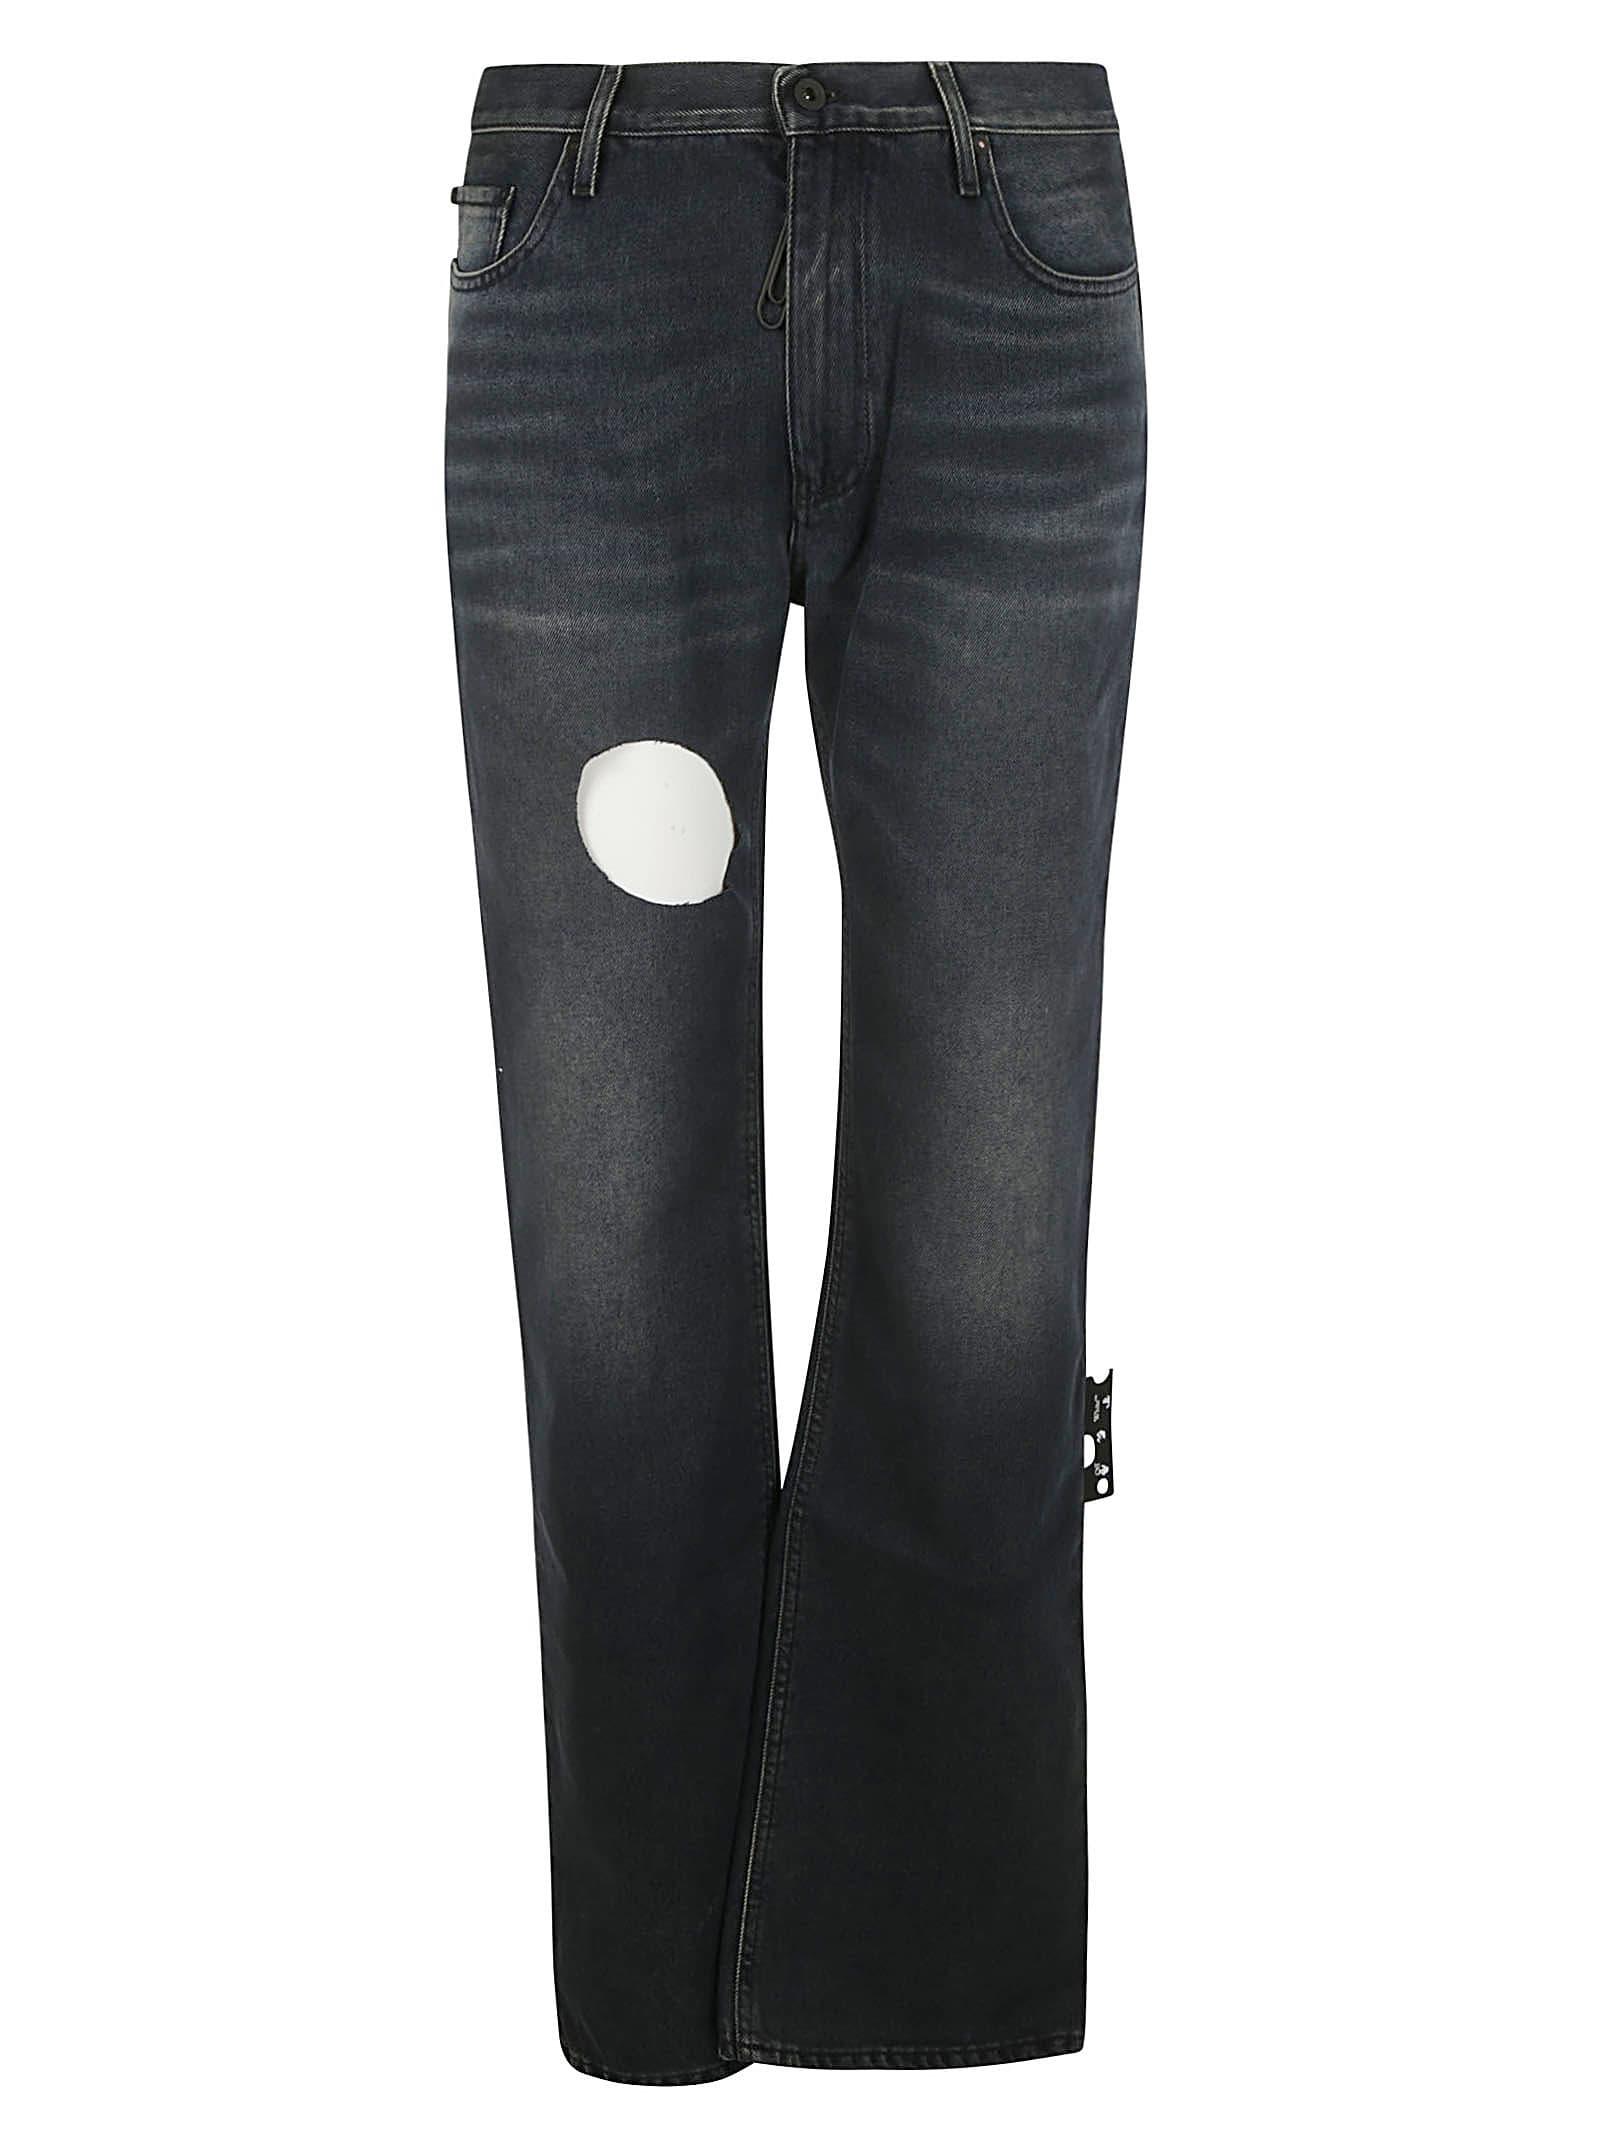 Off-White Joseph Skinny Stack Jeans